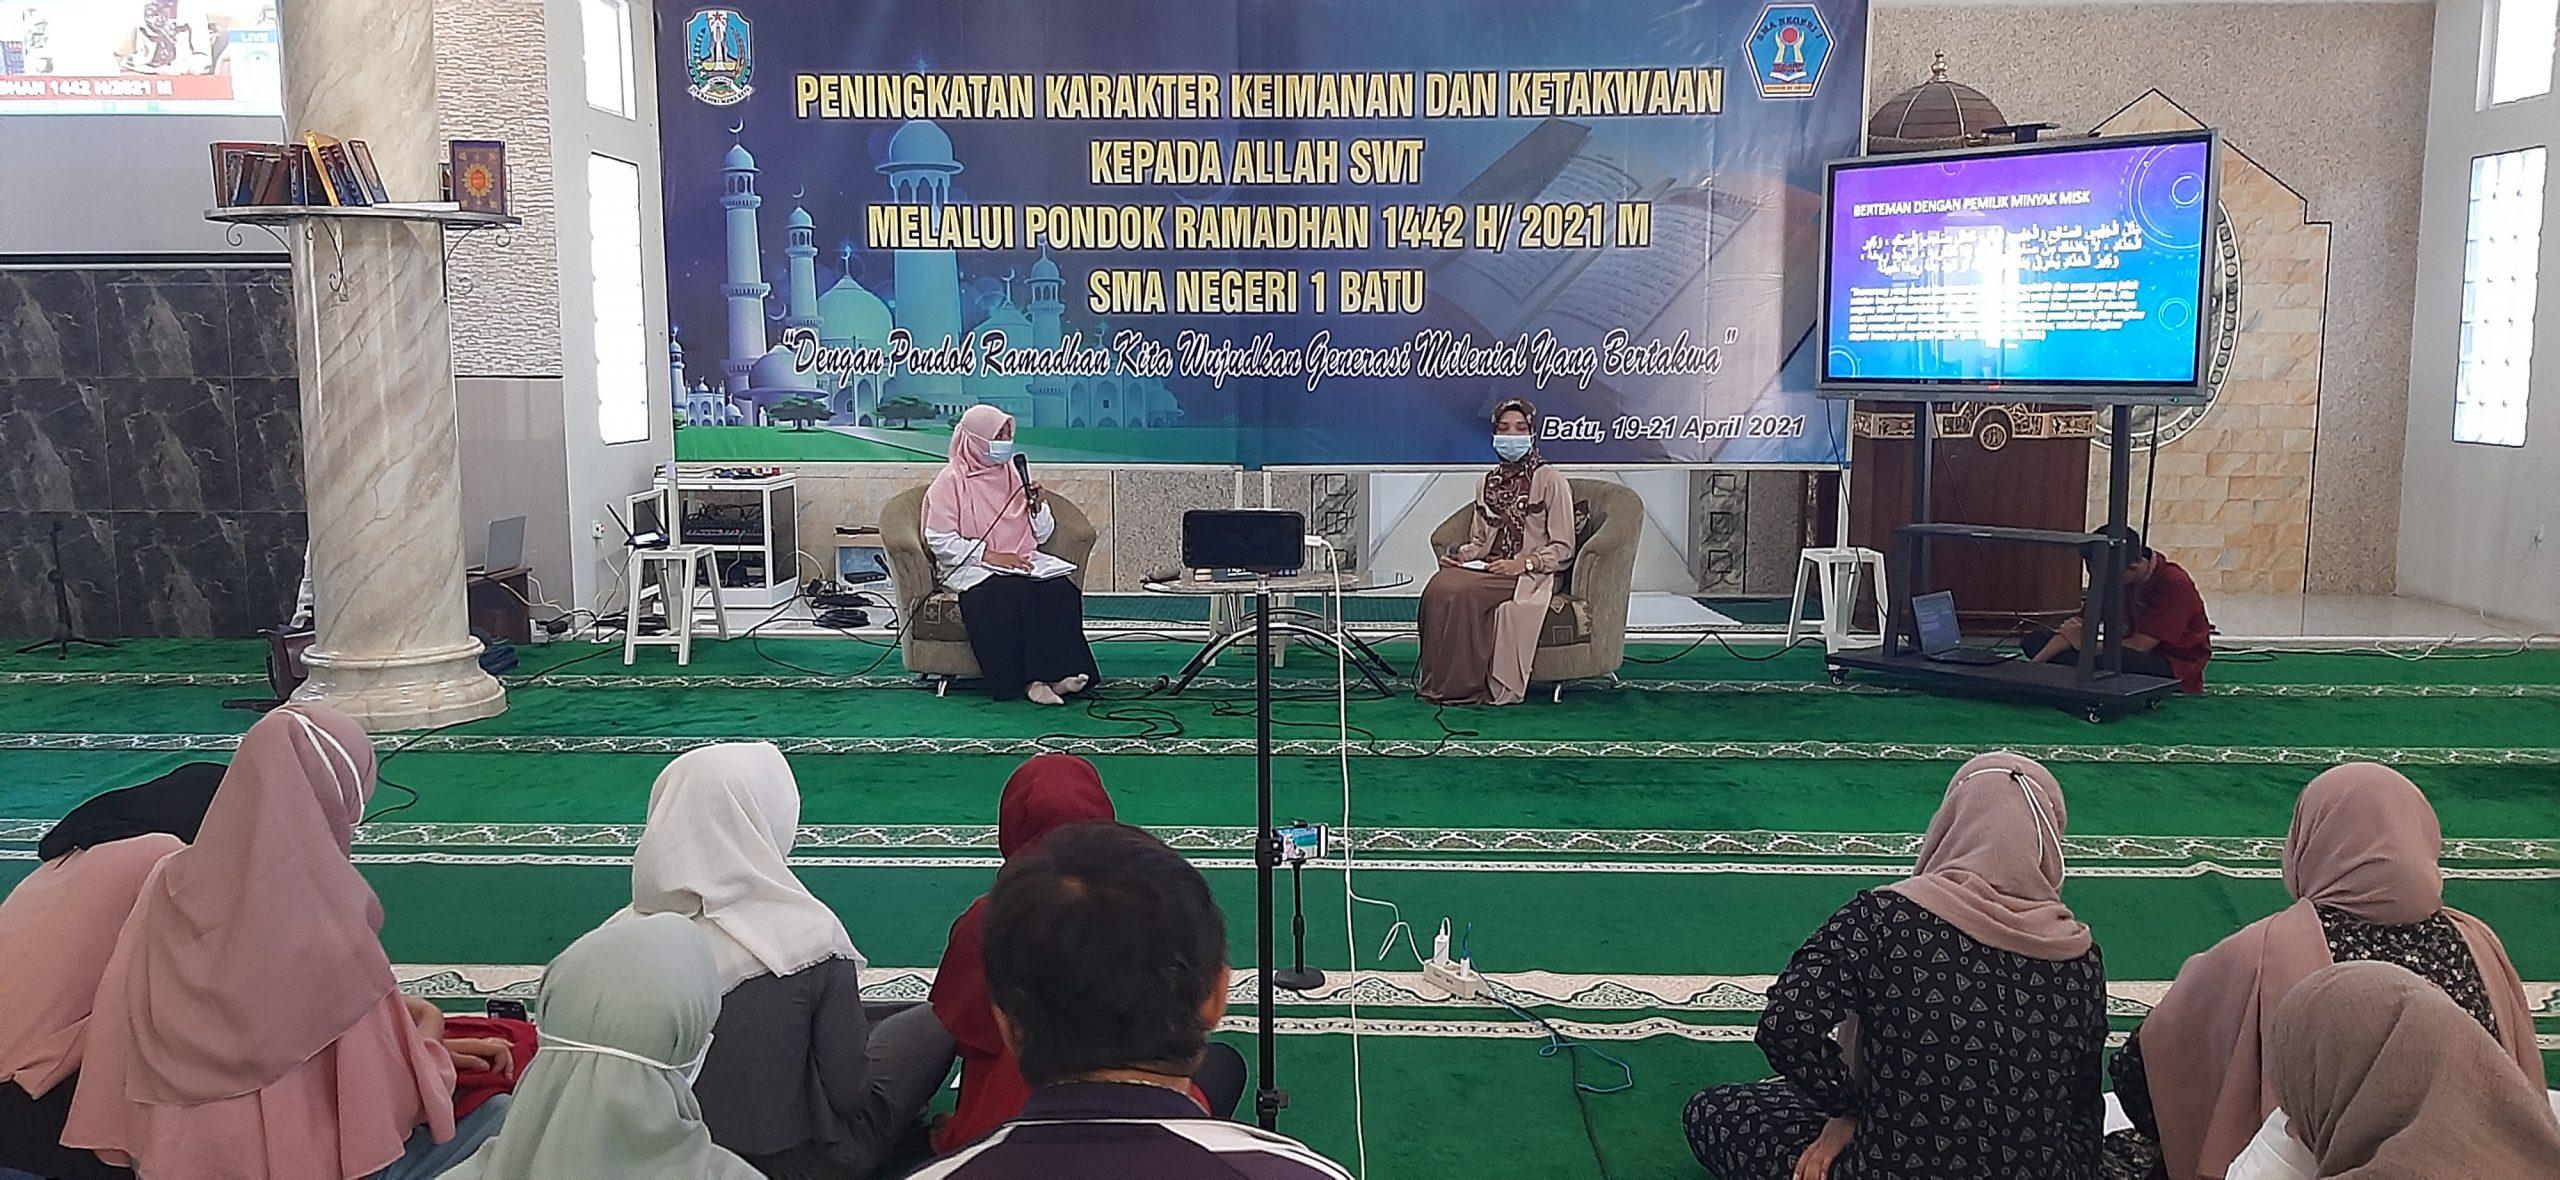 Pondok Ramadan 2021